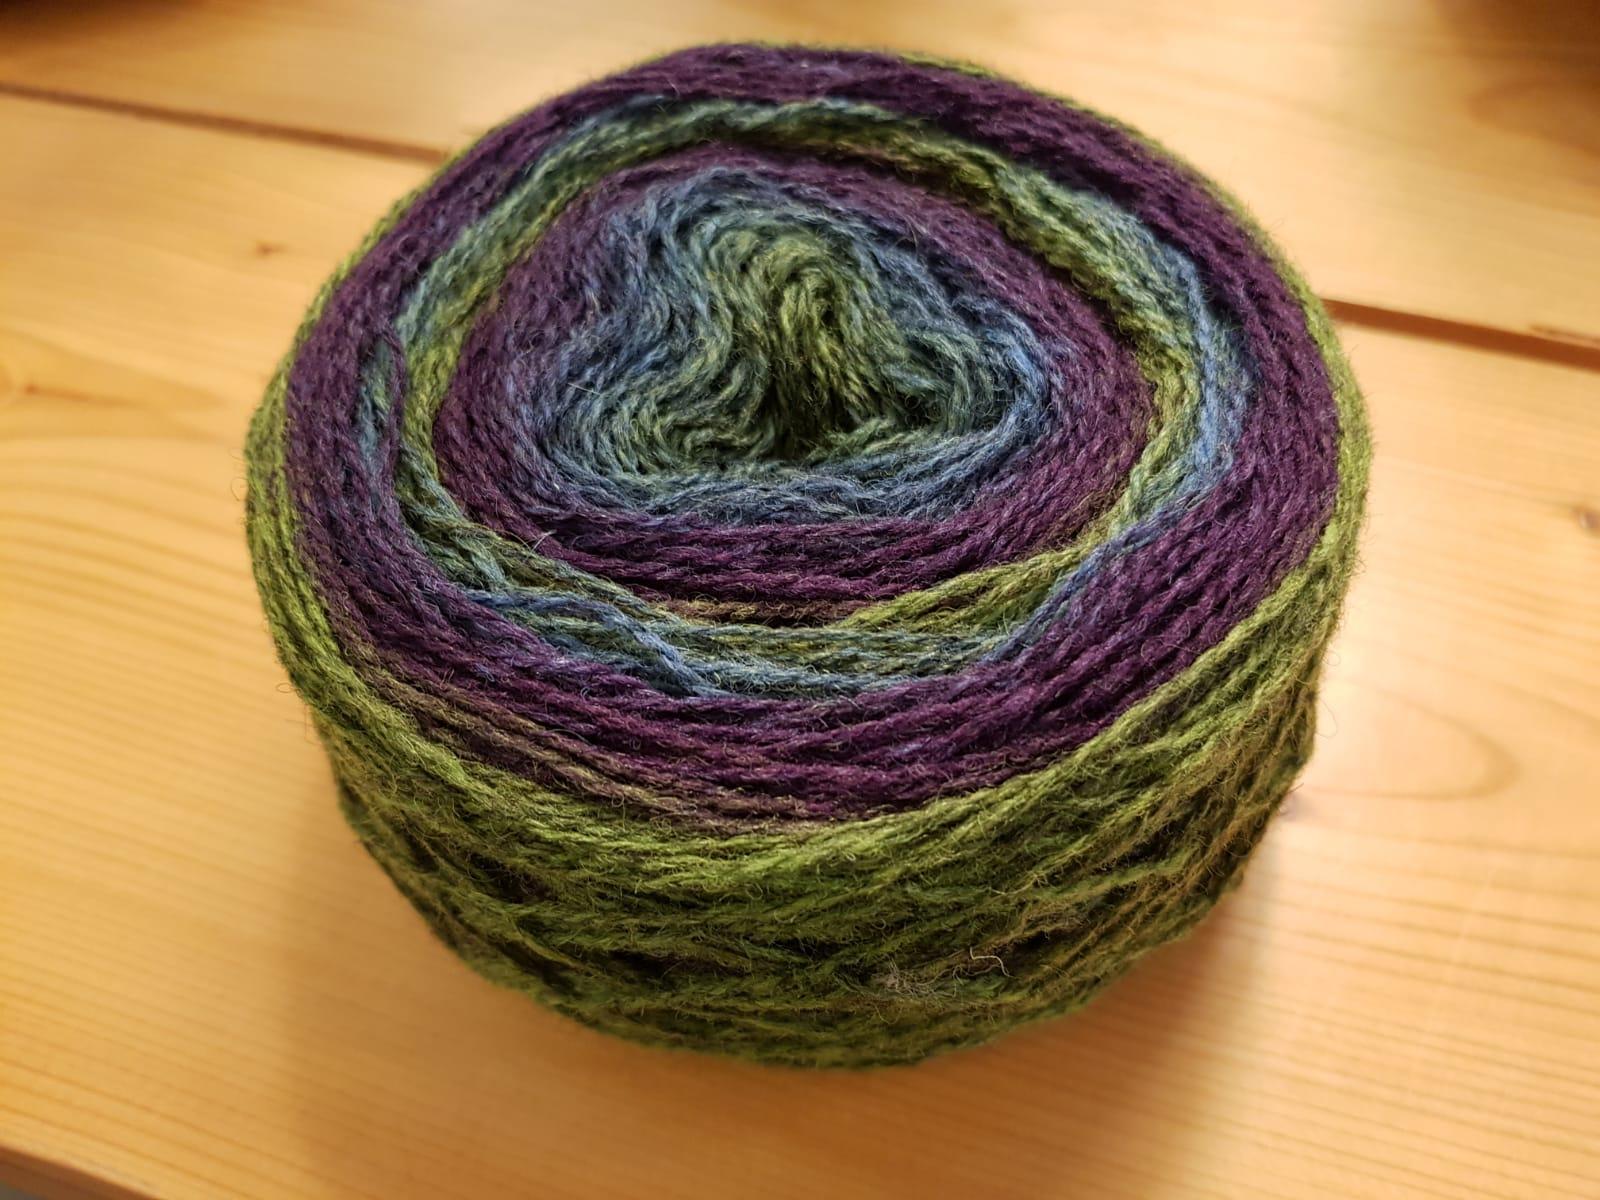 Ullcentrum 8/2-727 Blau-Grün-Lila Blue-Green-Purple